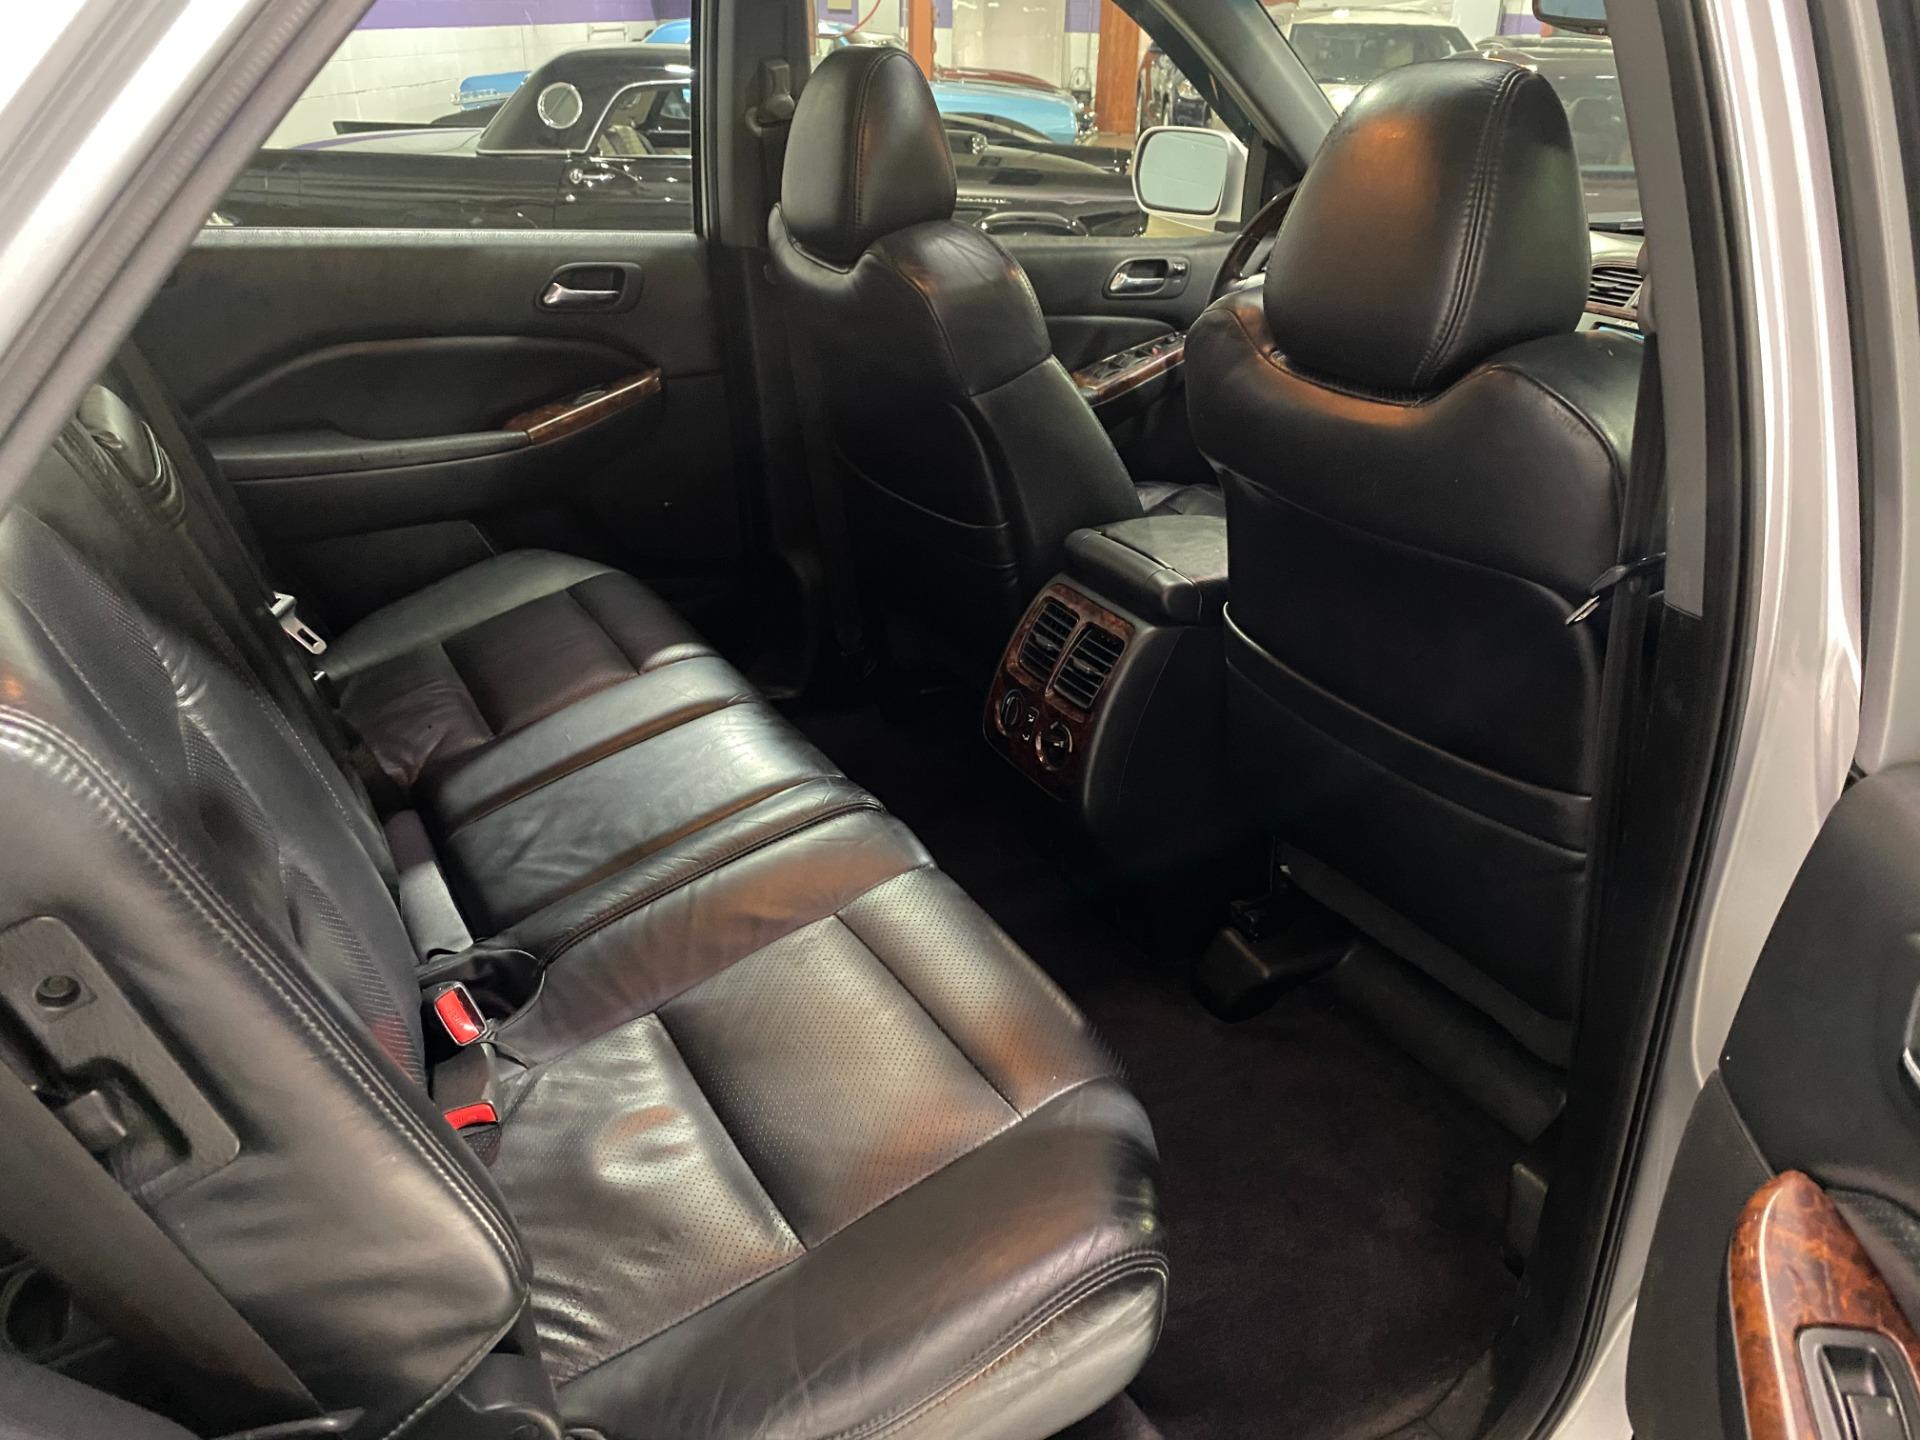 Used-2001-Acura-MDX